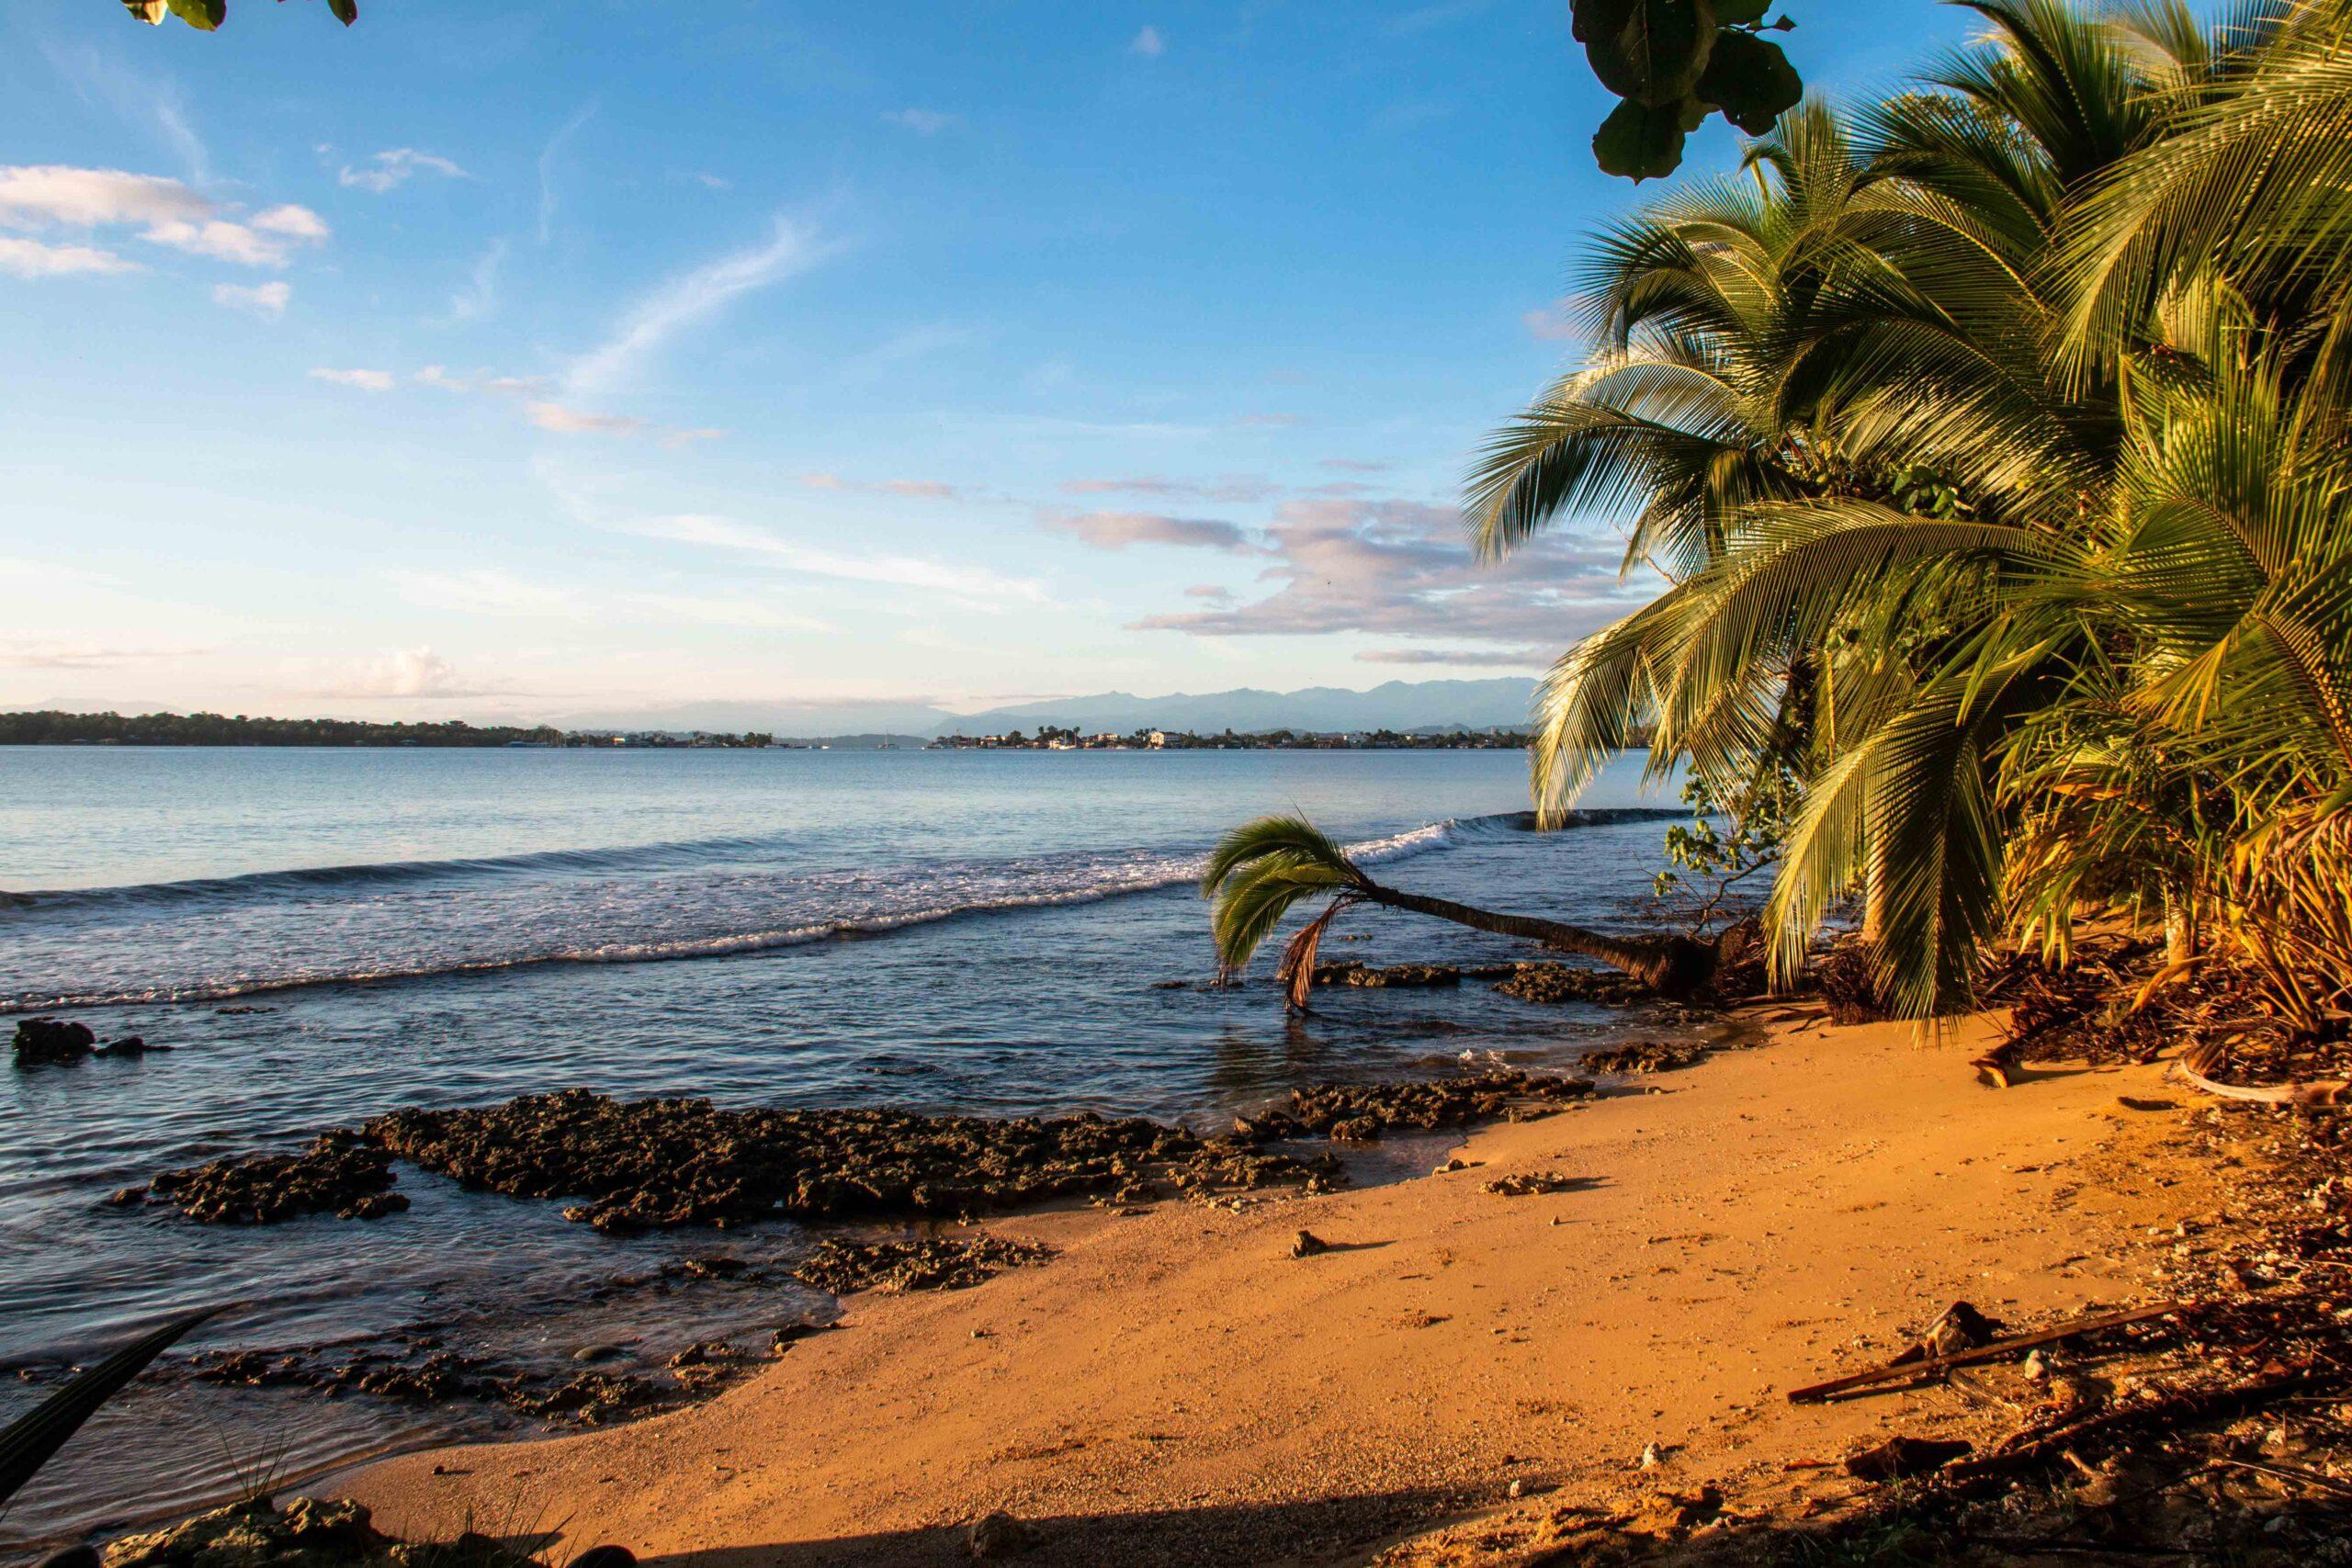 Playa Paunch Bocas del Toro